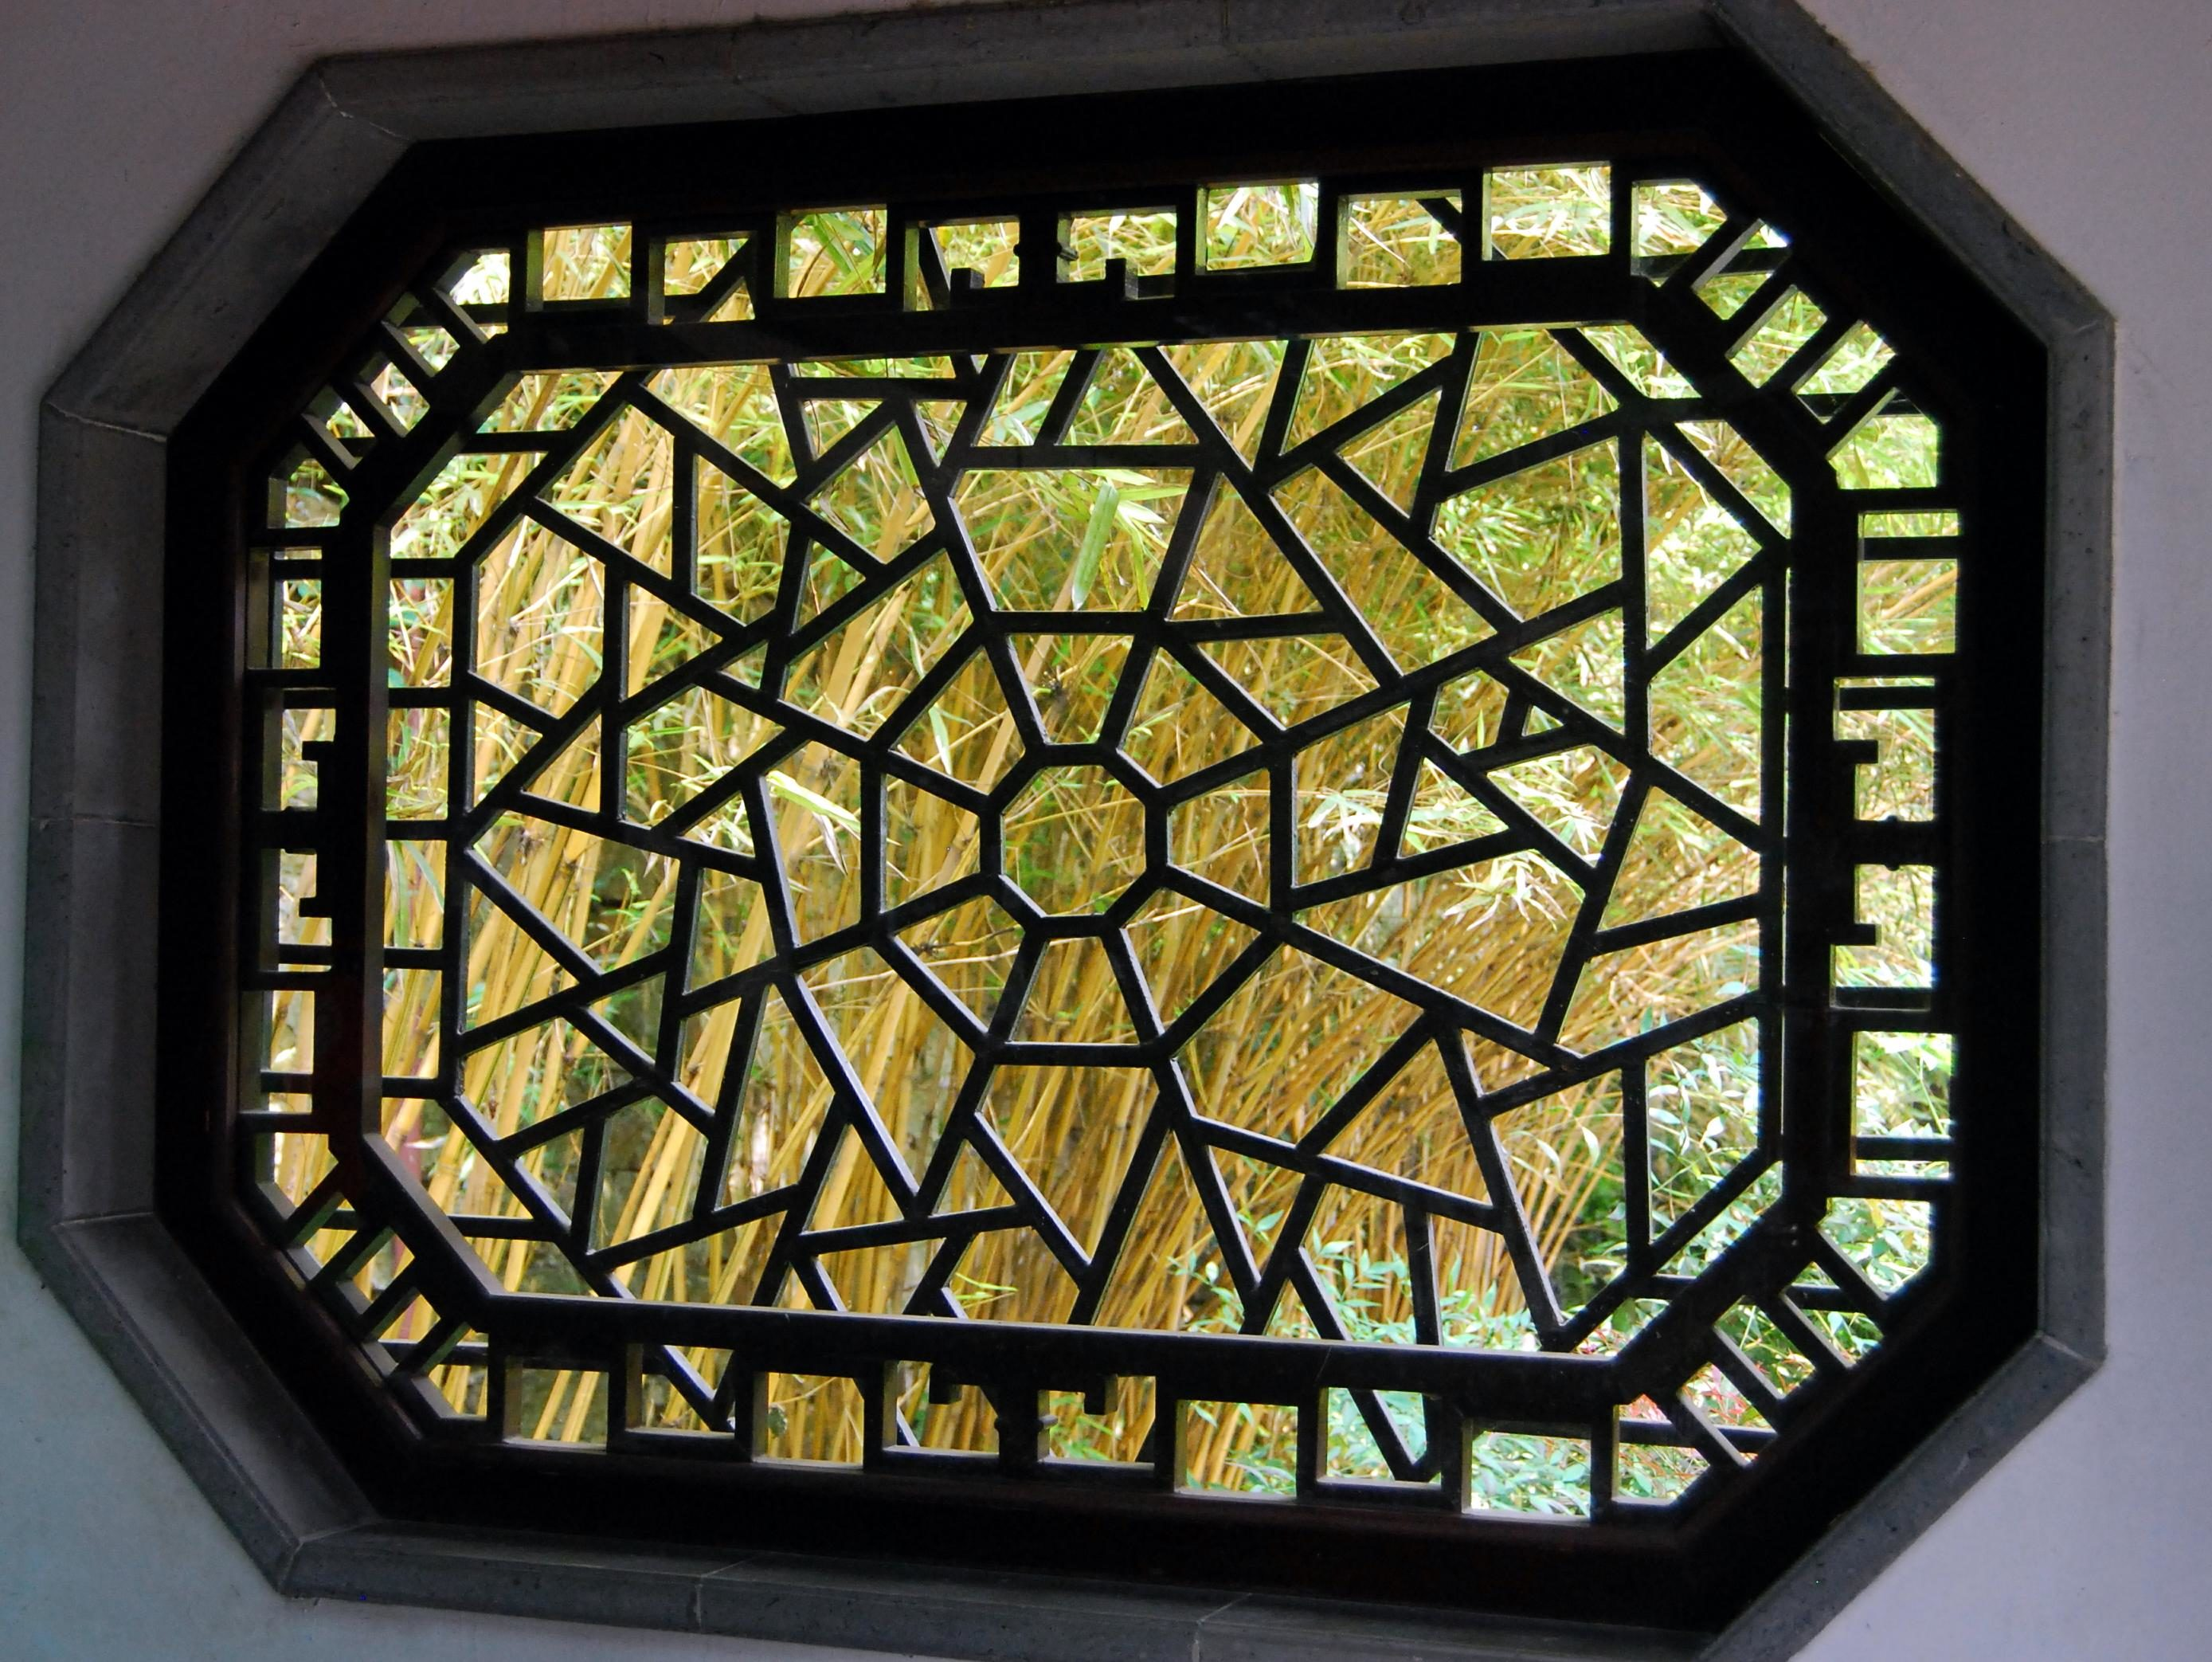 Imagen gratis: diseño, ventana, marco, ventana, arte, arquitectura ...